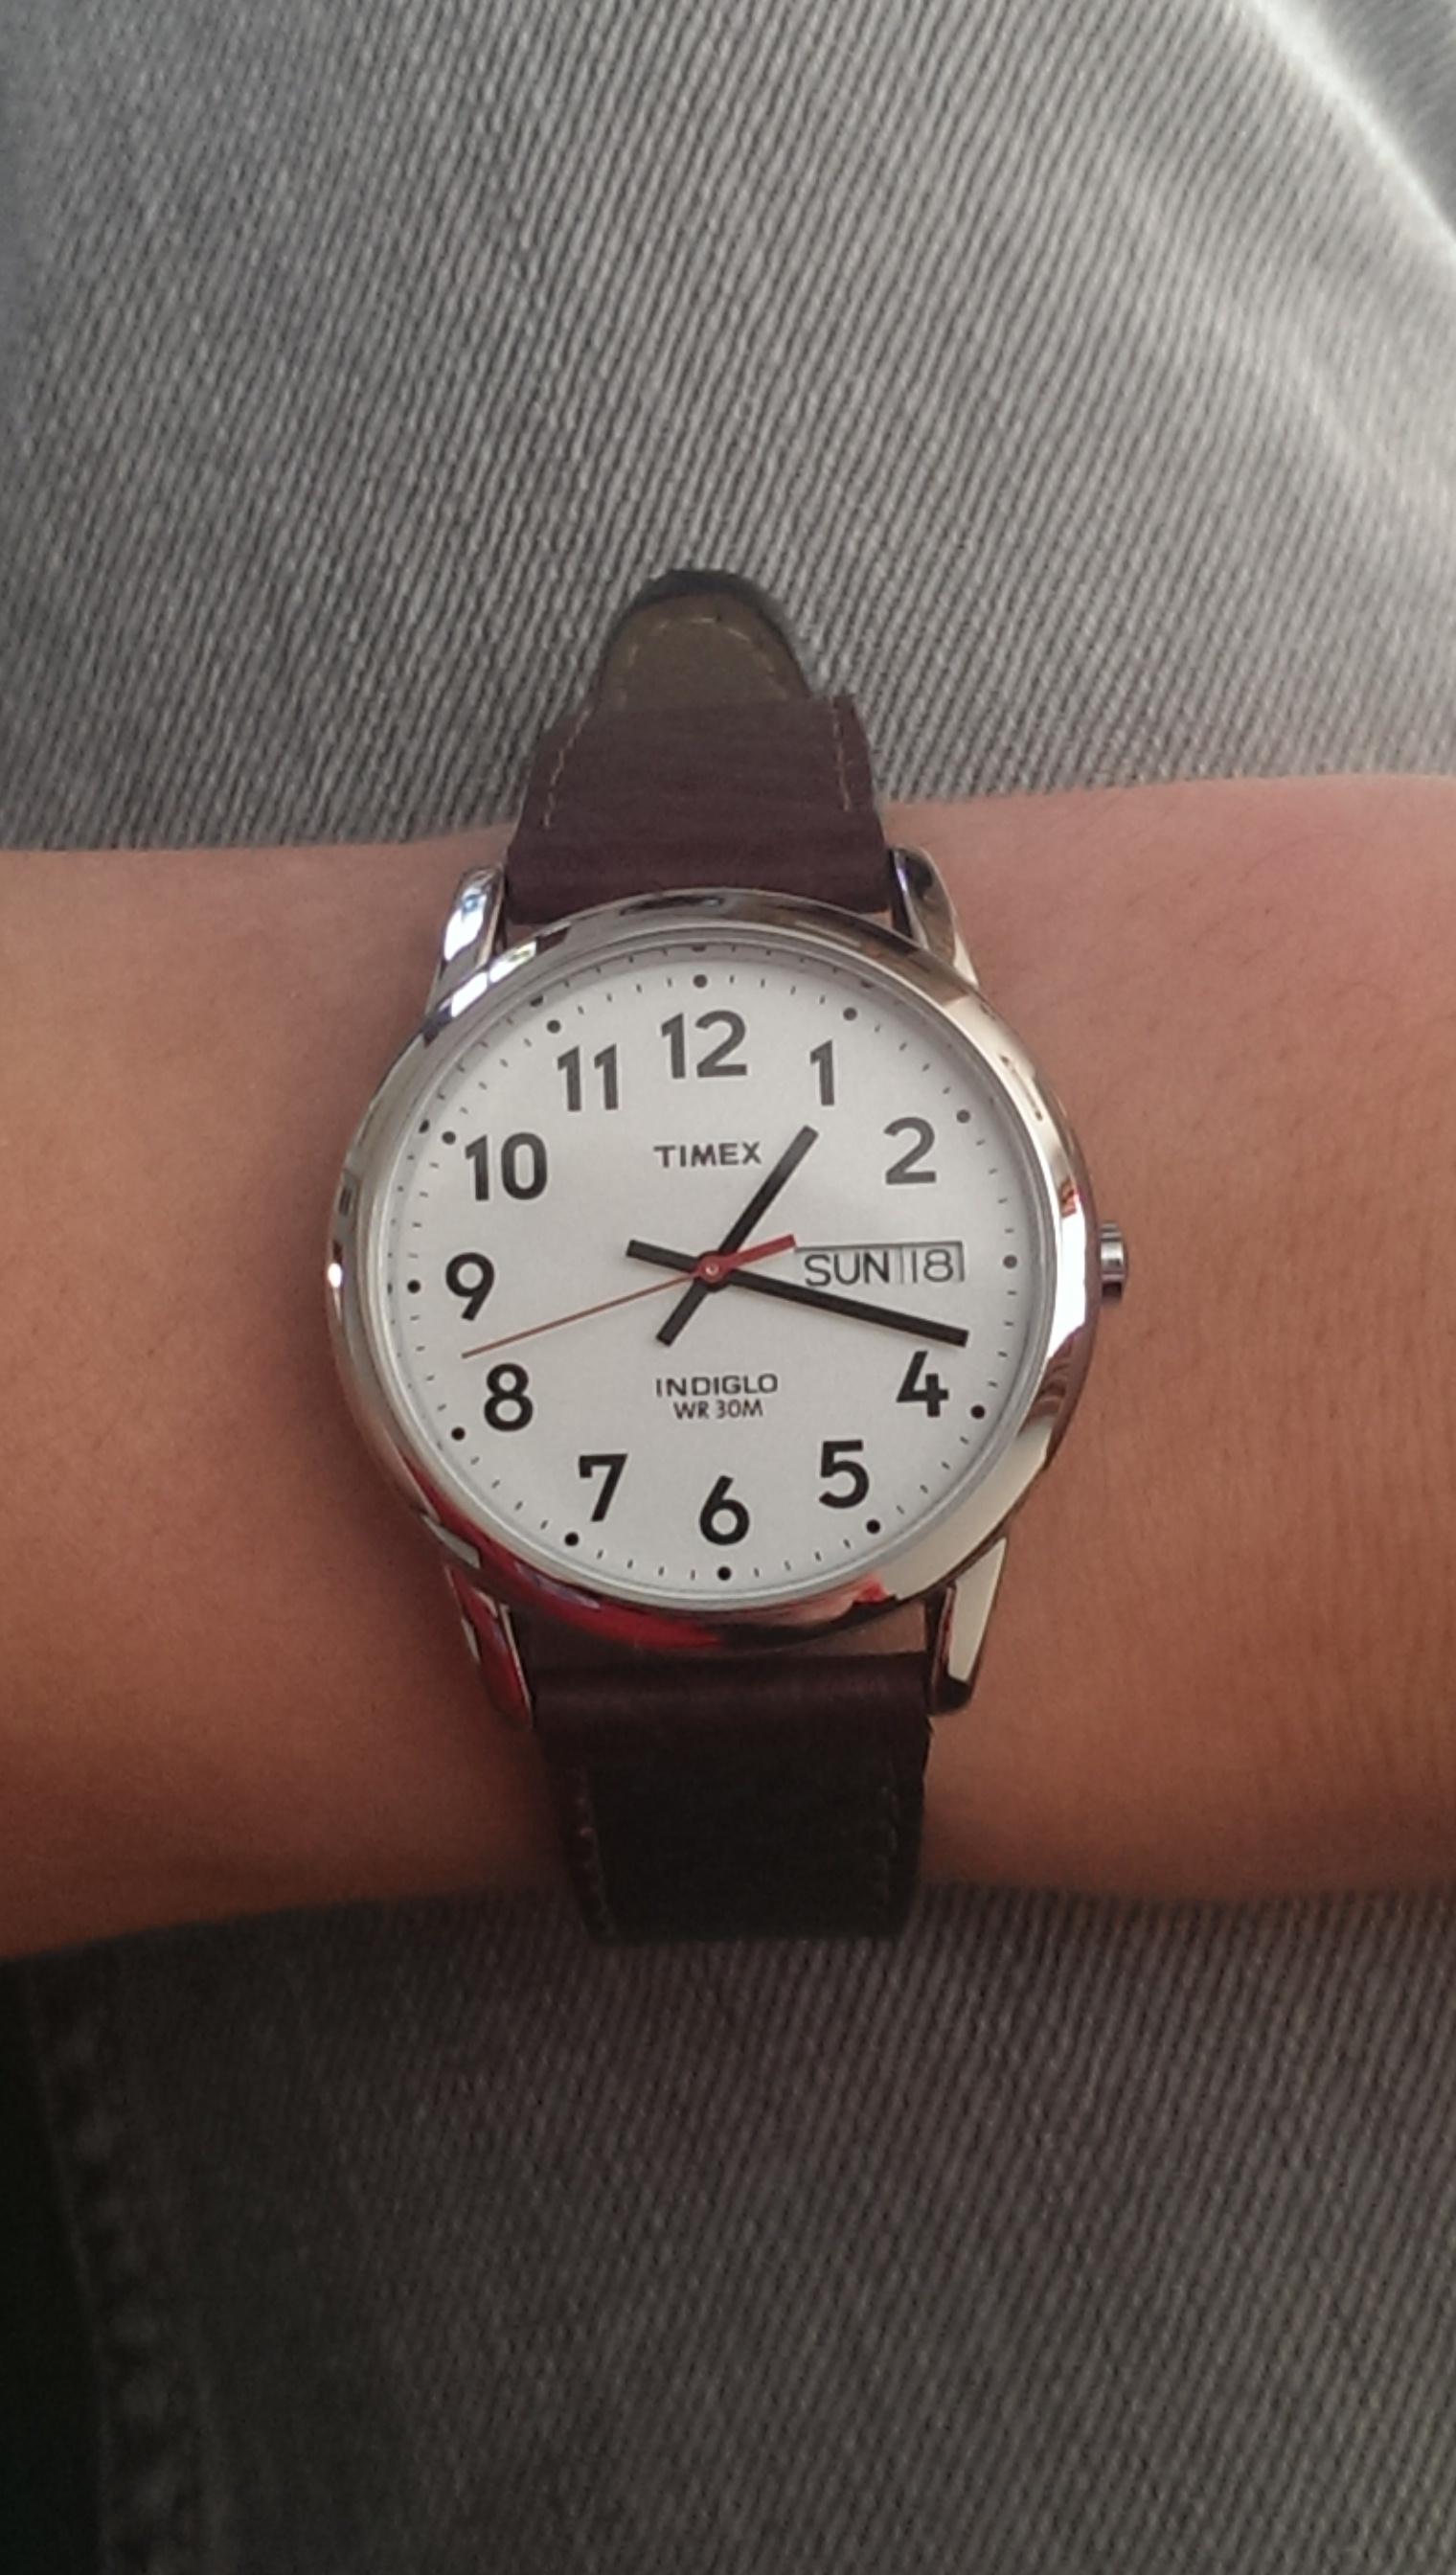 b9f89c471 Gents Timex Easy Reader Watch (T20041)   WatchShop.com™